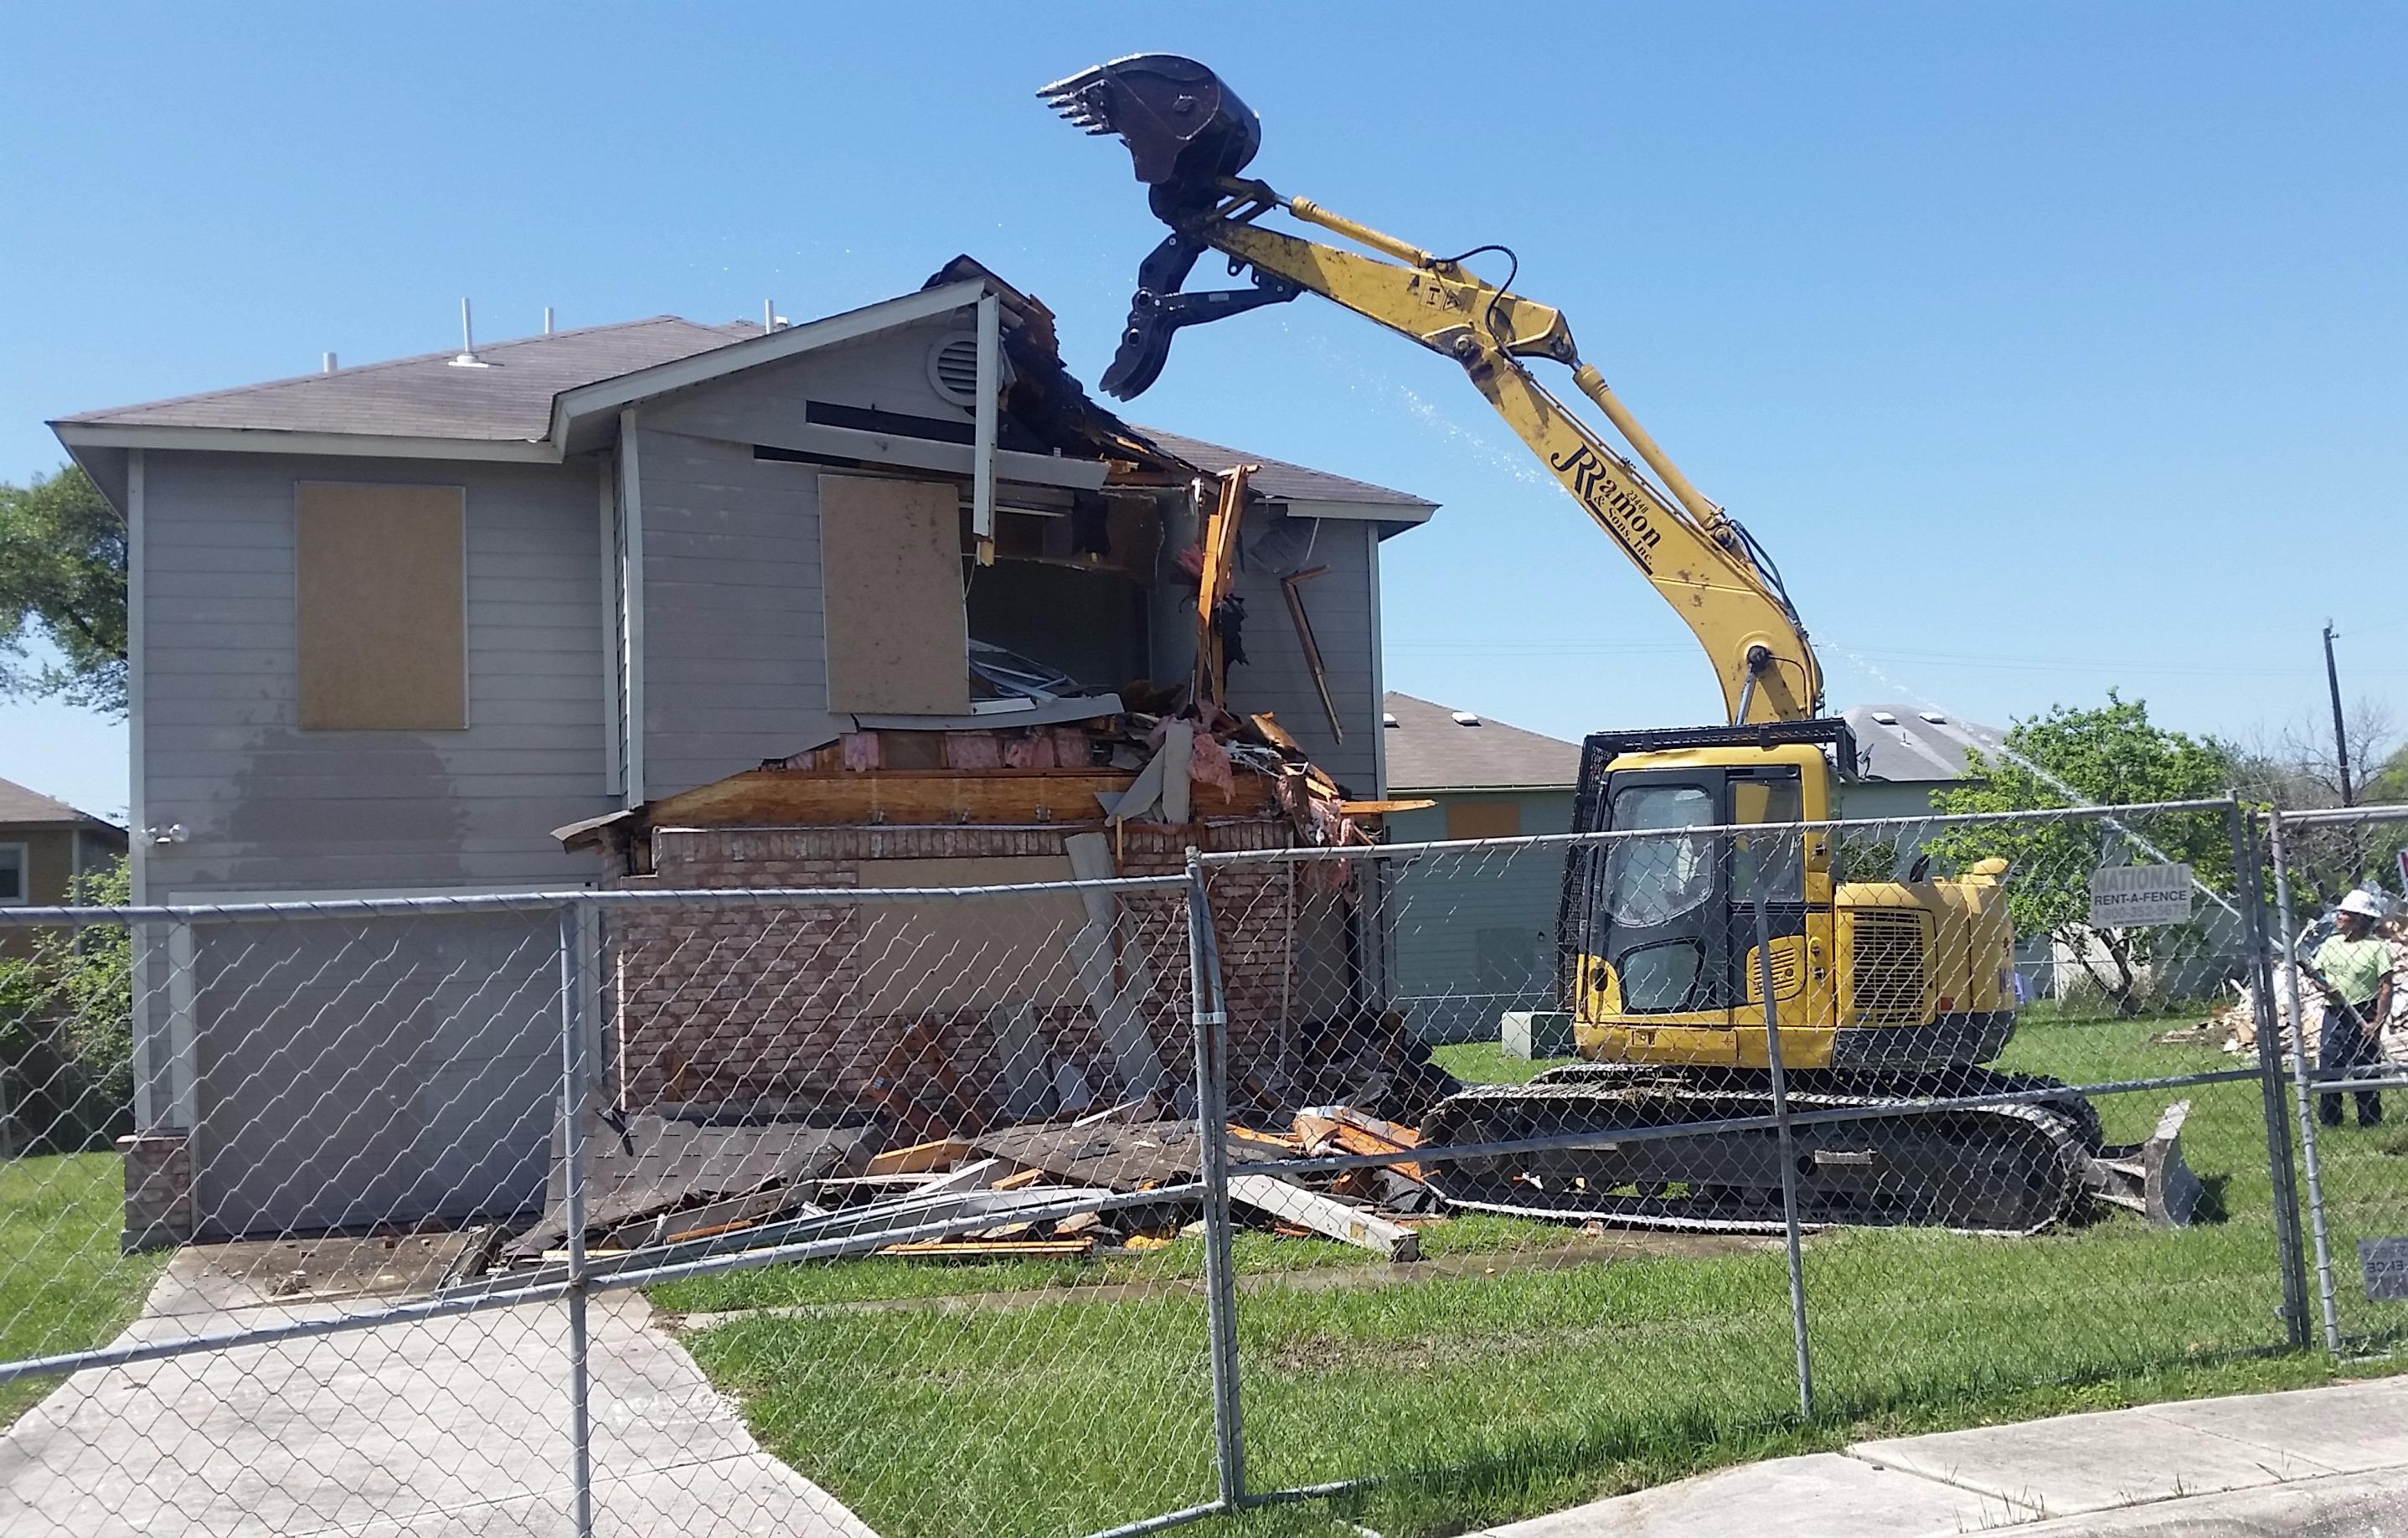 JR Ramon Demolition image 1